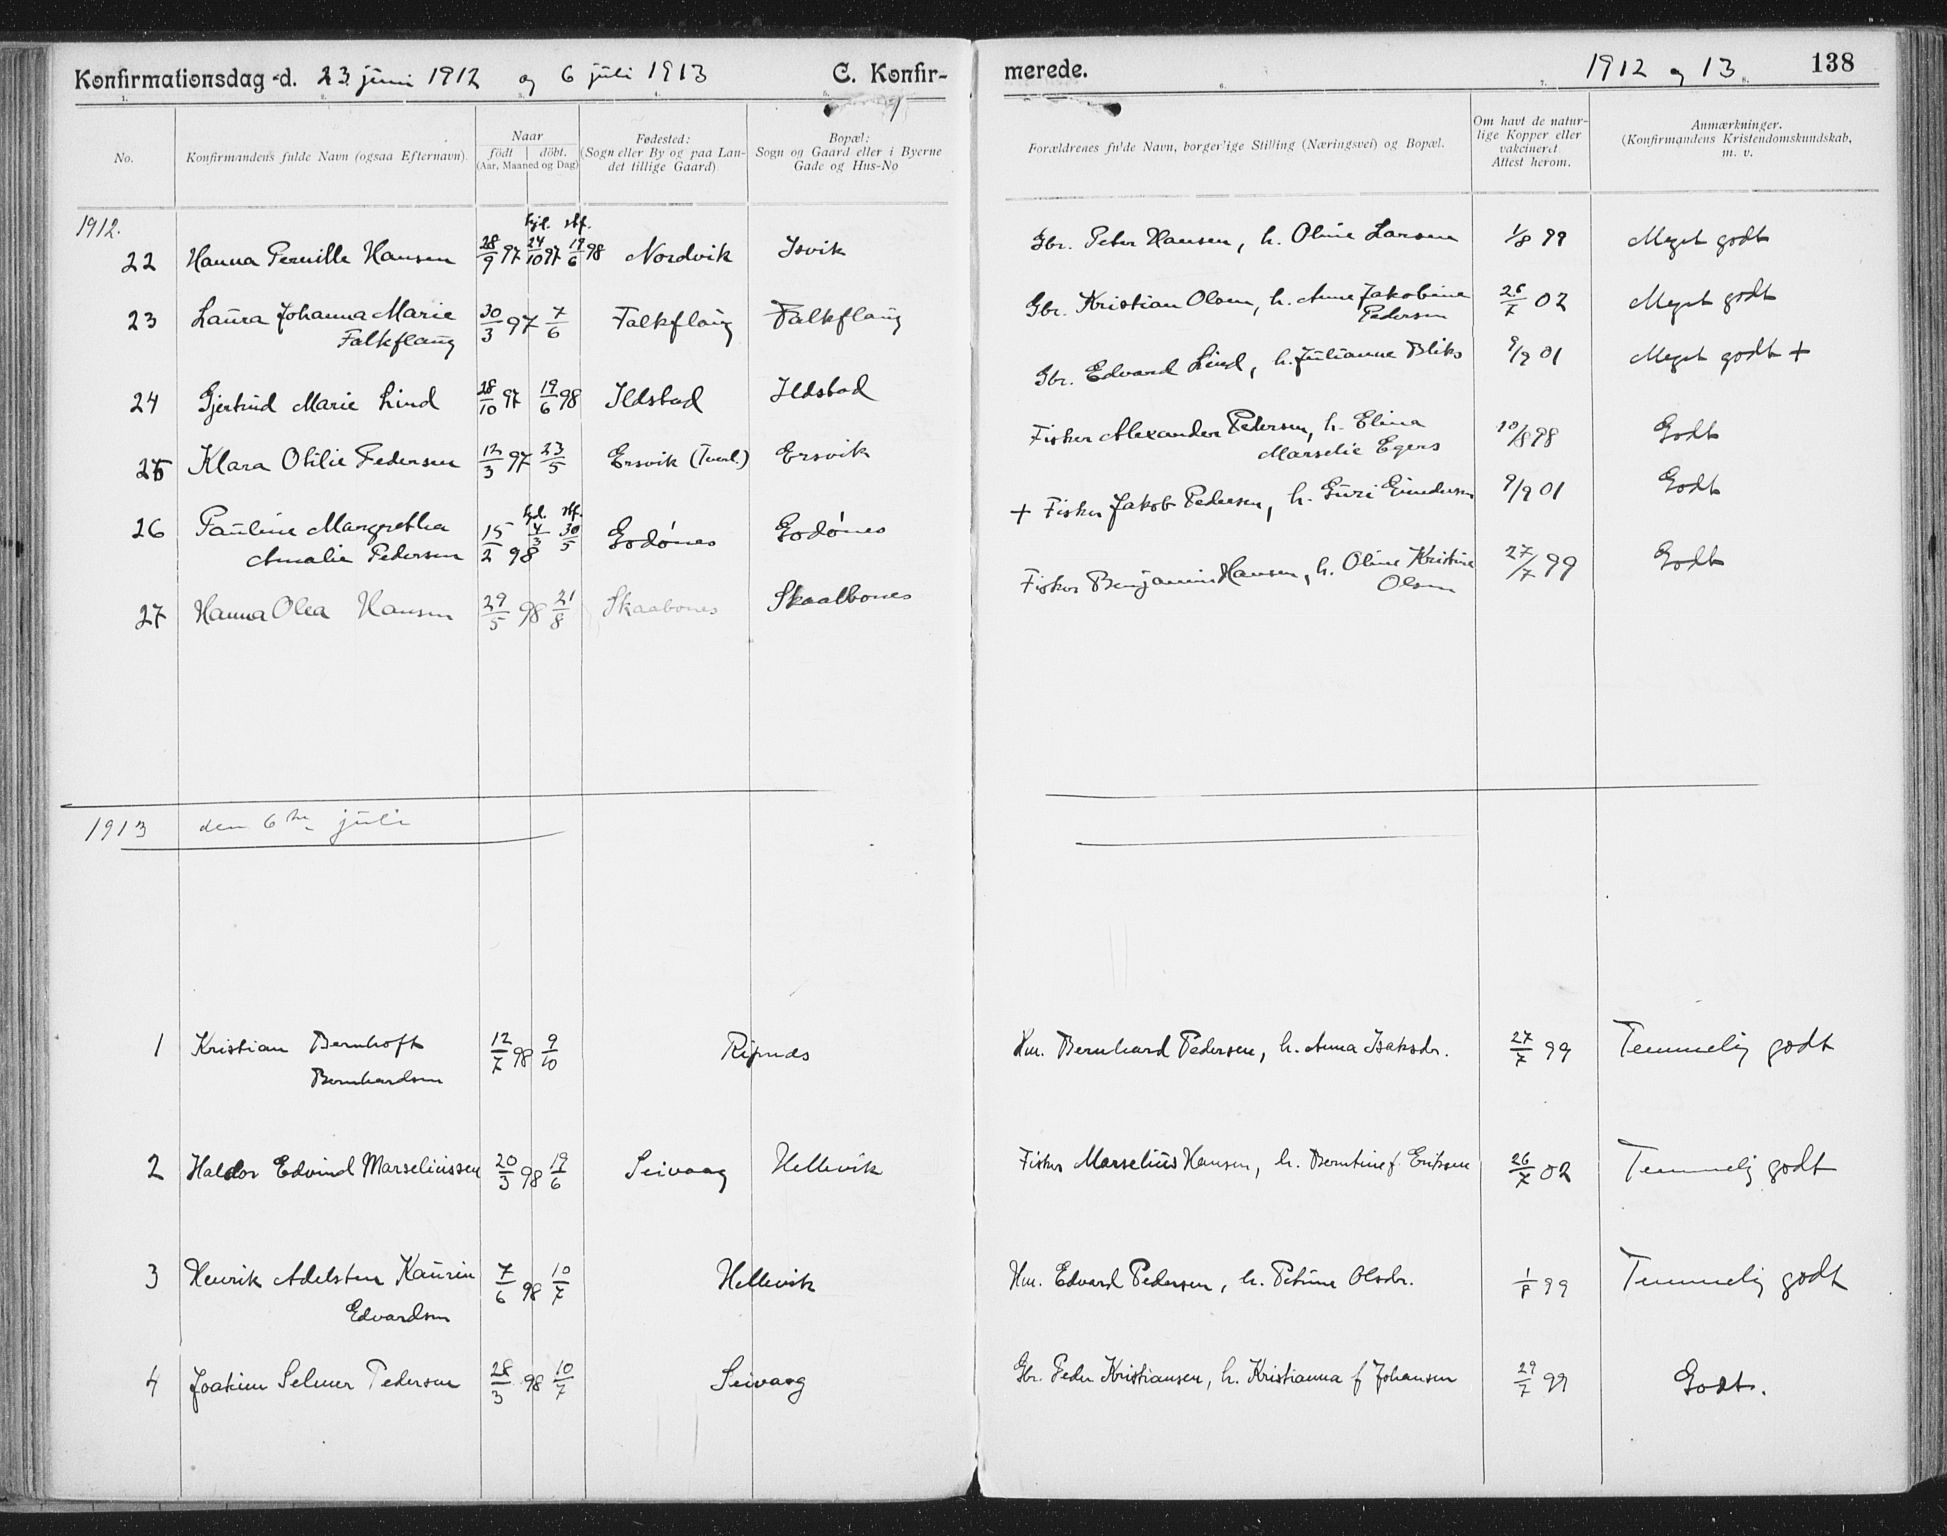 SAT, Ministerialprotokoller, klokkerbøker og fødselsregistre - Nordland, 804/L0081: Ministerialbok nr. 804A02, 1901-1915, s. 138